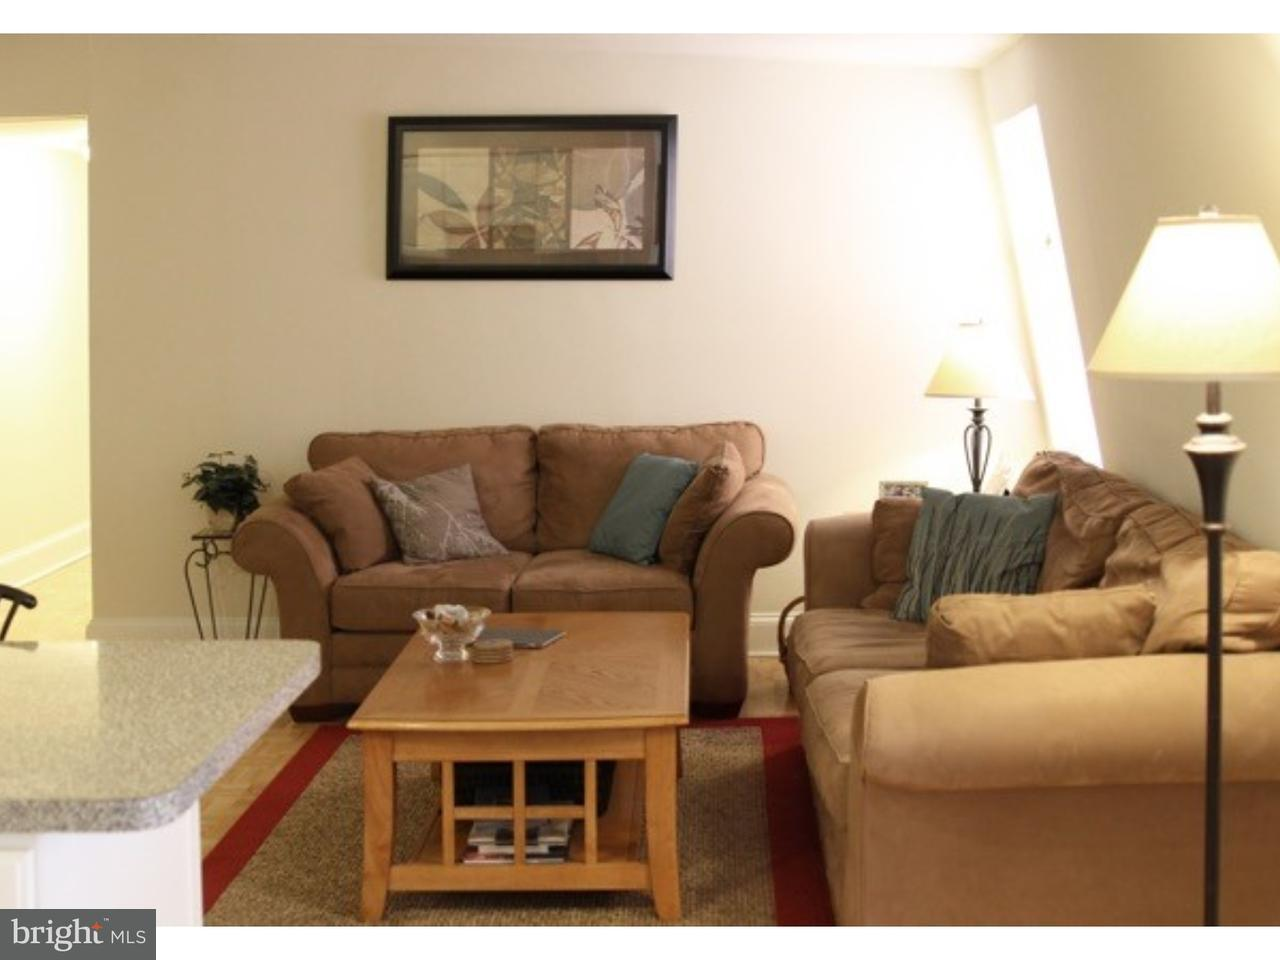 Single Family Home for Rent at 1417 SPRUCE ST #4R Philadelphia, Pennsylvania 19102 United States